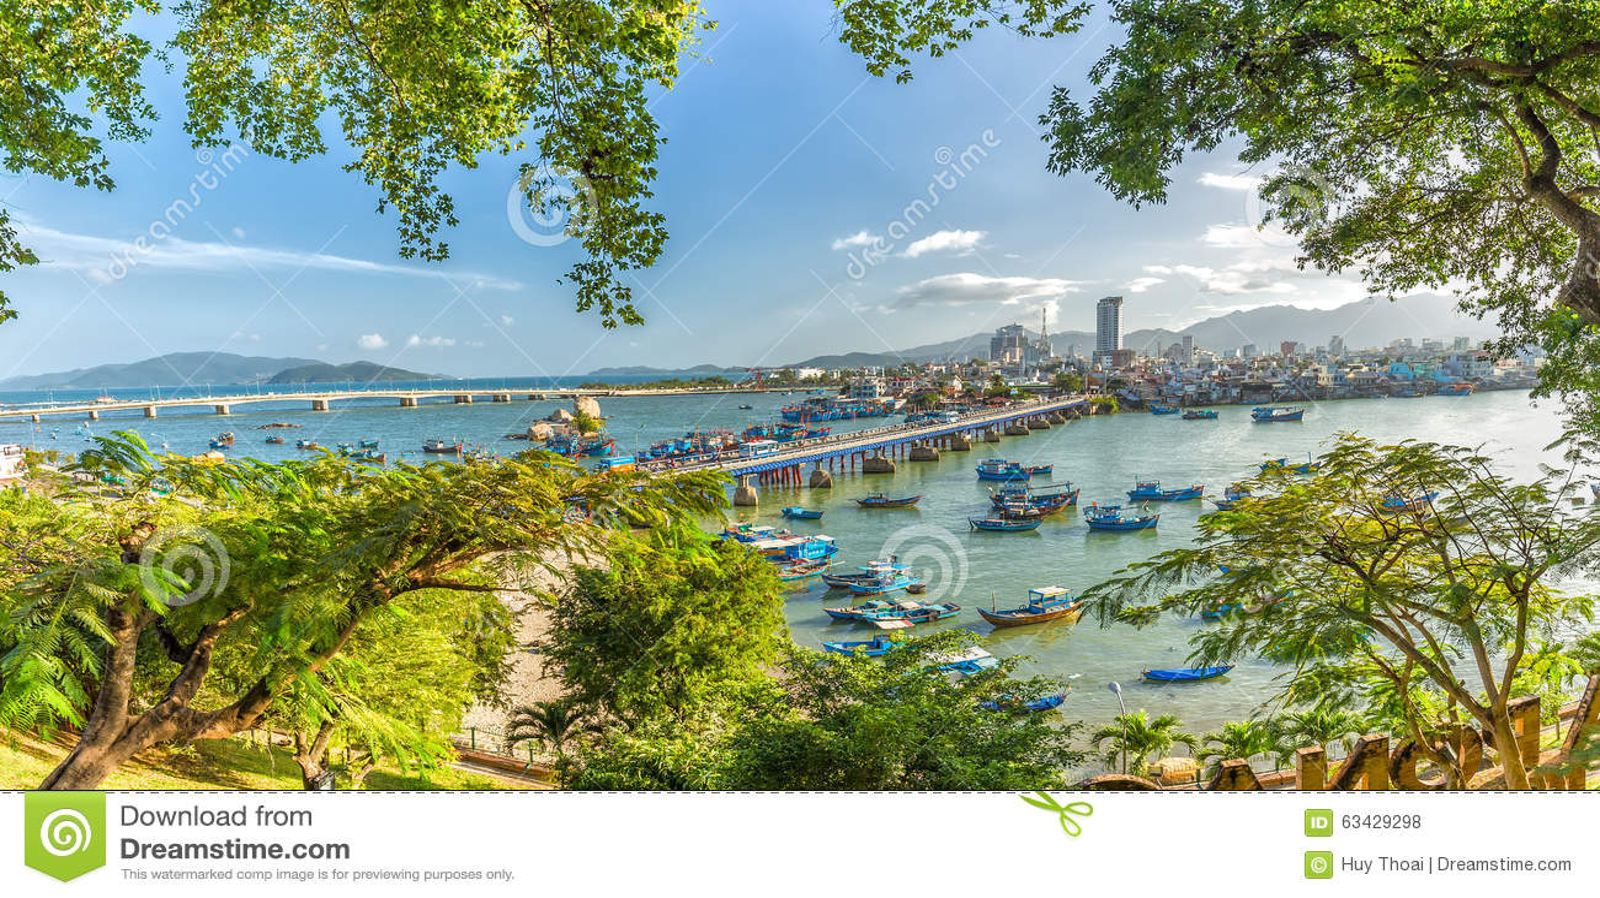 Khanh Hoa Vietnam  city images : In Khanh Hoa, Vietnam February 2nd, 2015: Panorama Boating spring ...